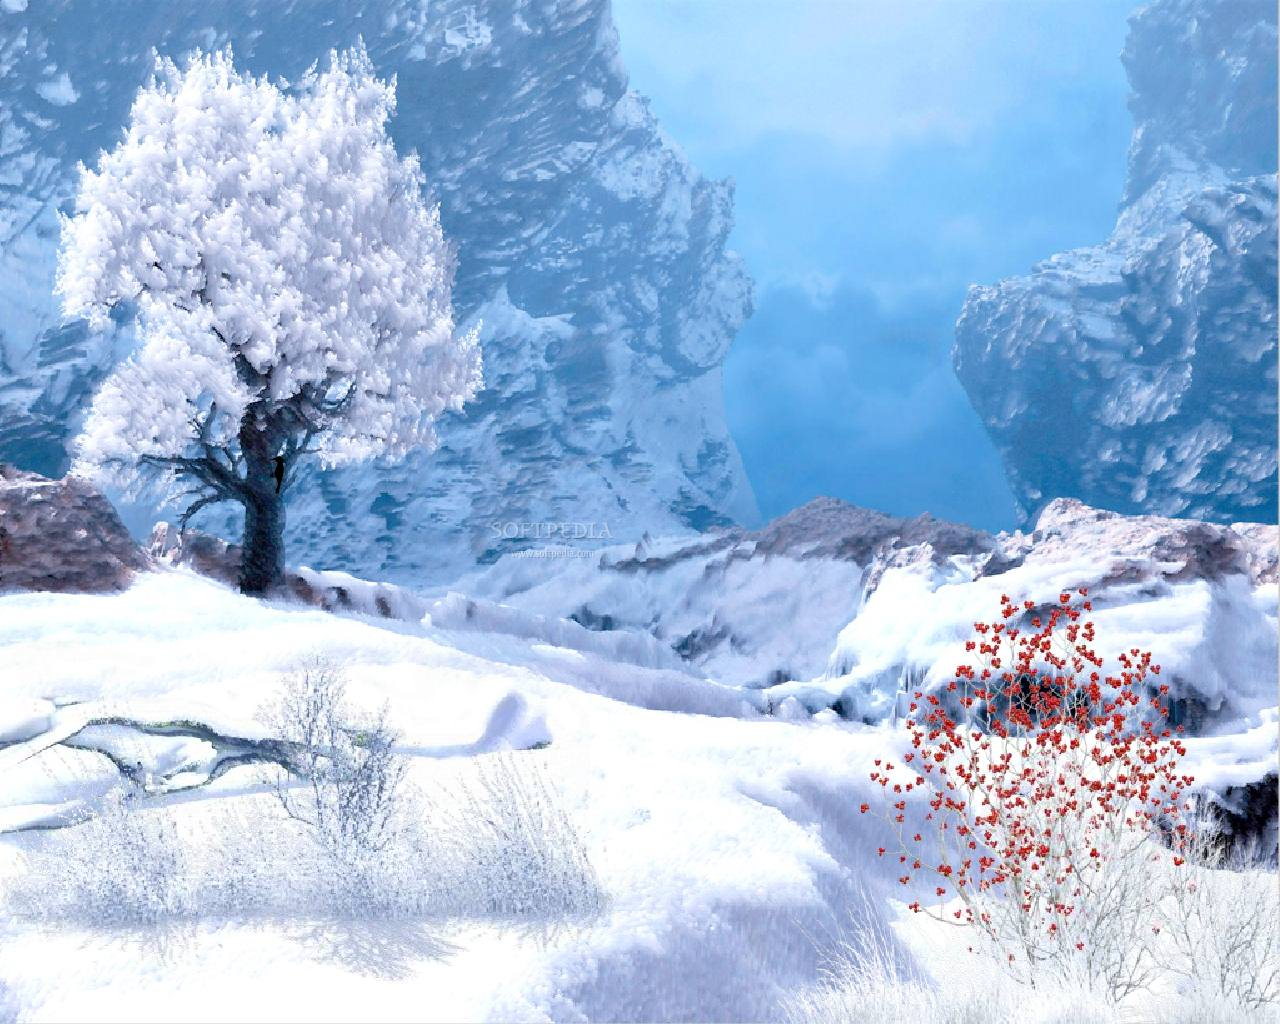 Winter Wonderland | Bronies Wiki | FANDOM powered by Wikia